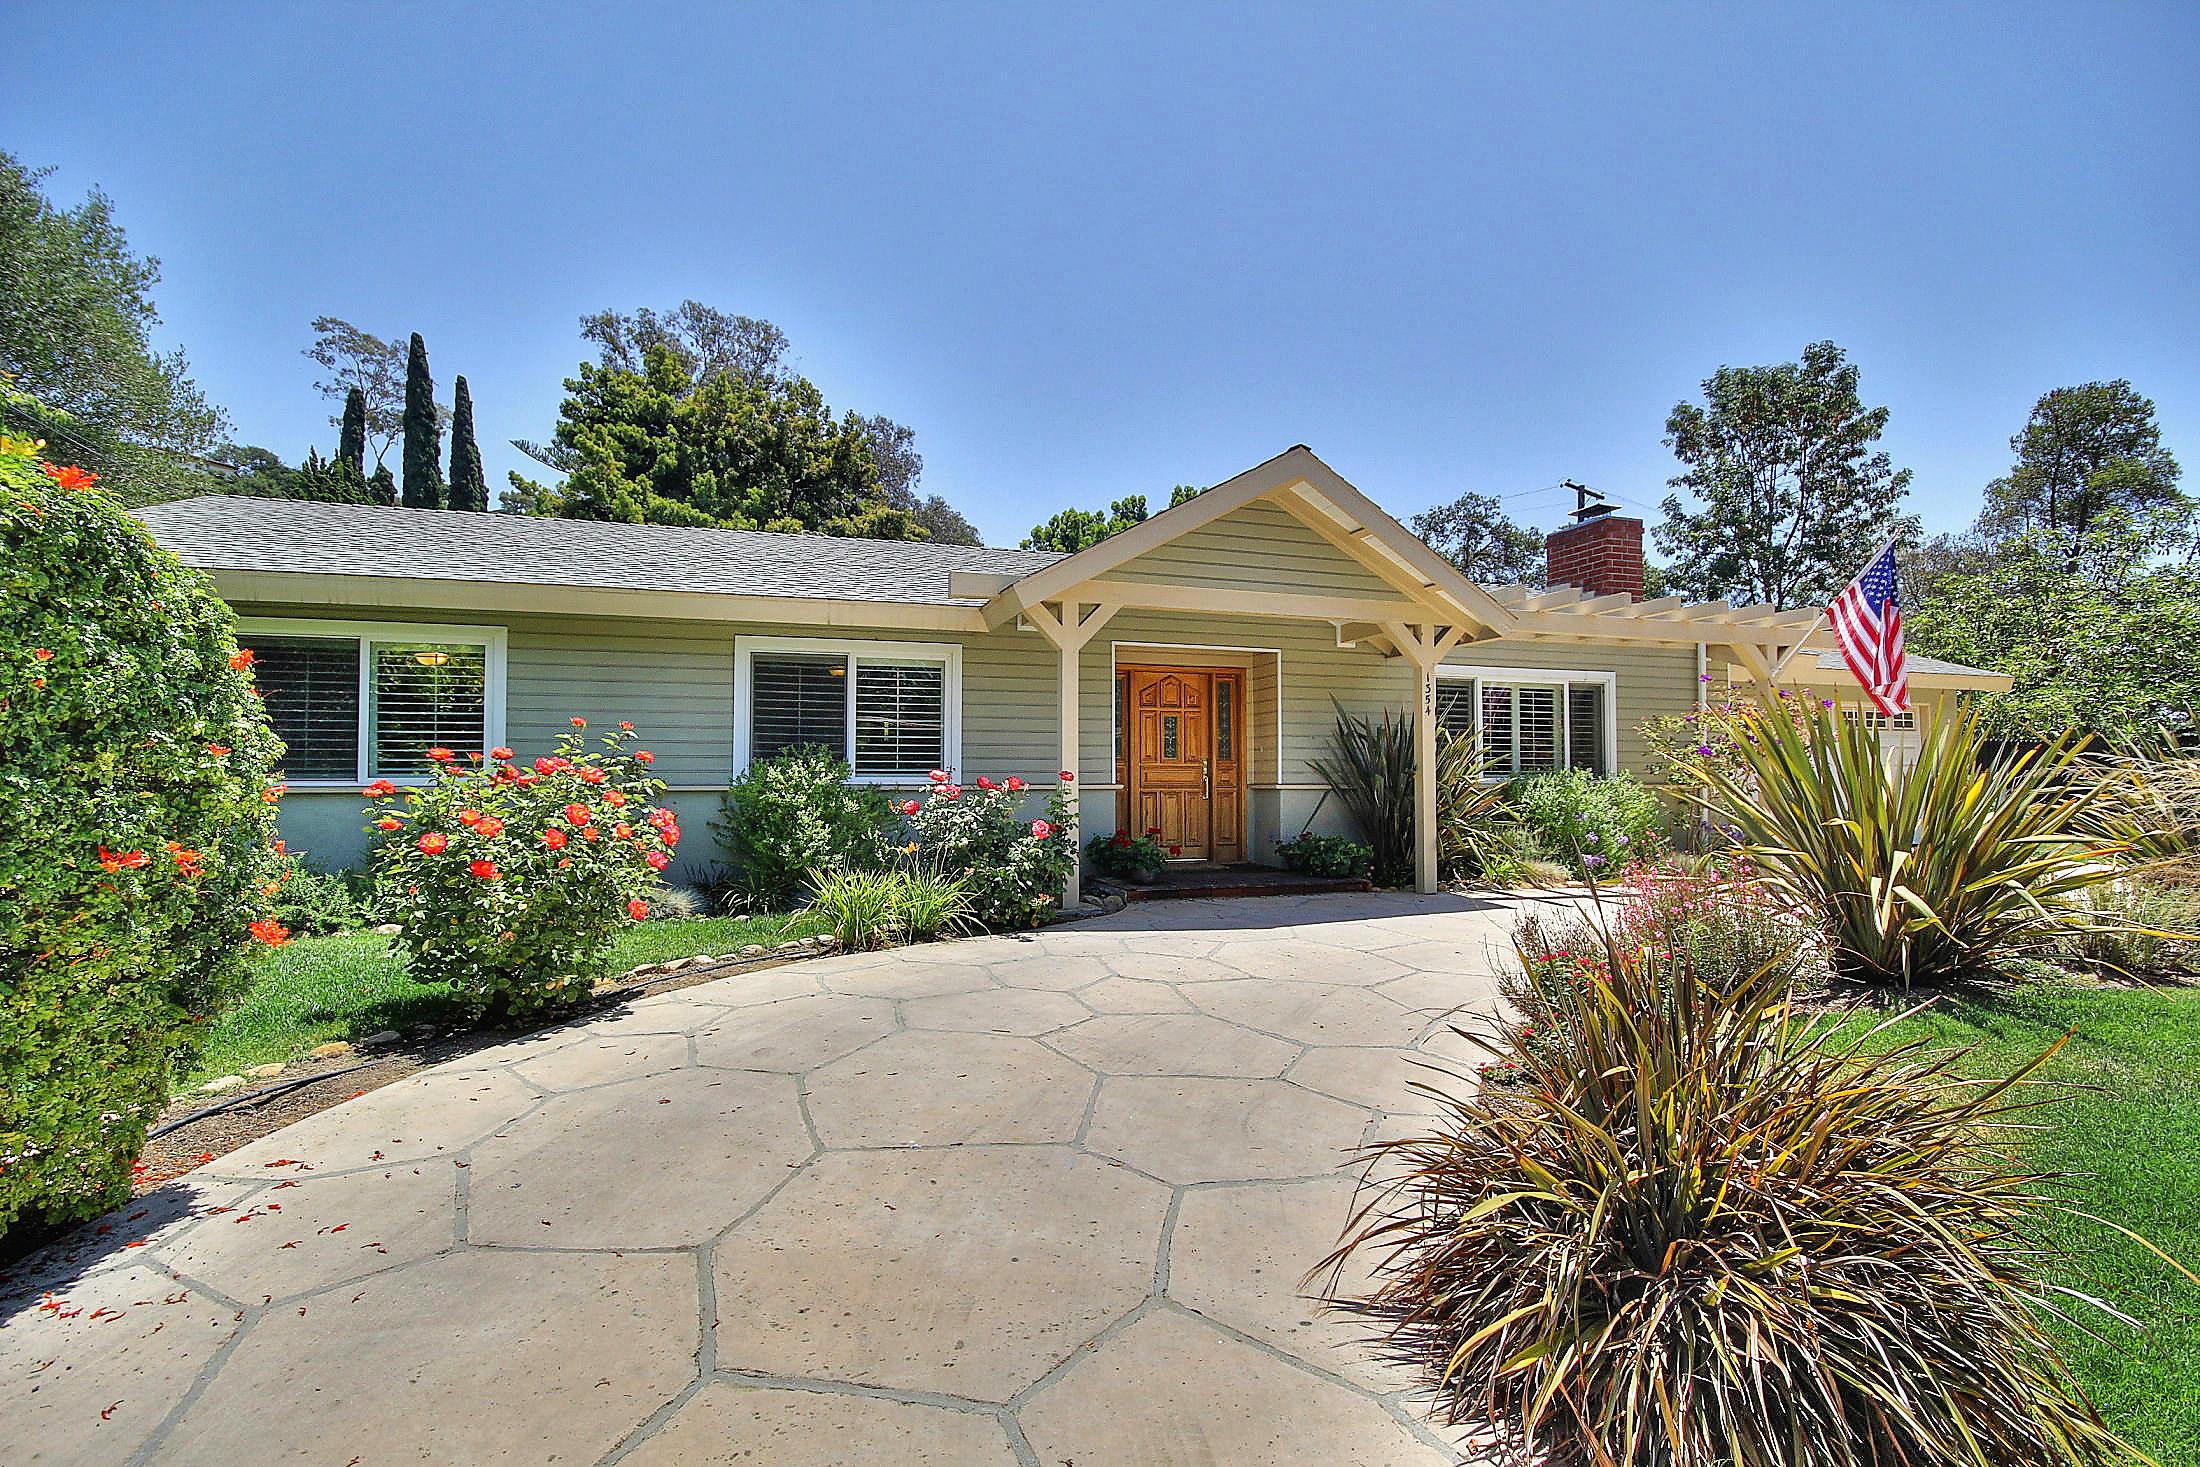 Property photo for 1354 Sycamore Canyon Rd Santa Barbara, California 93108 - 14-2172